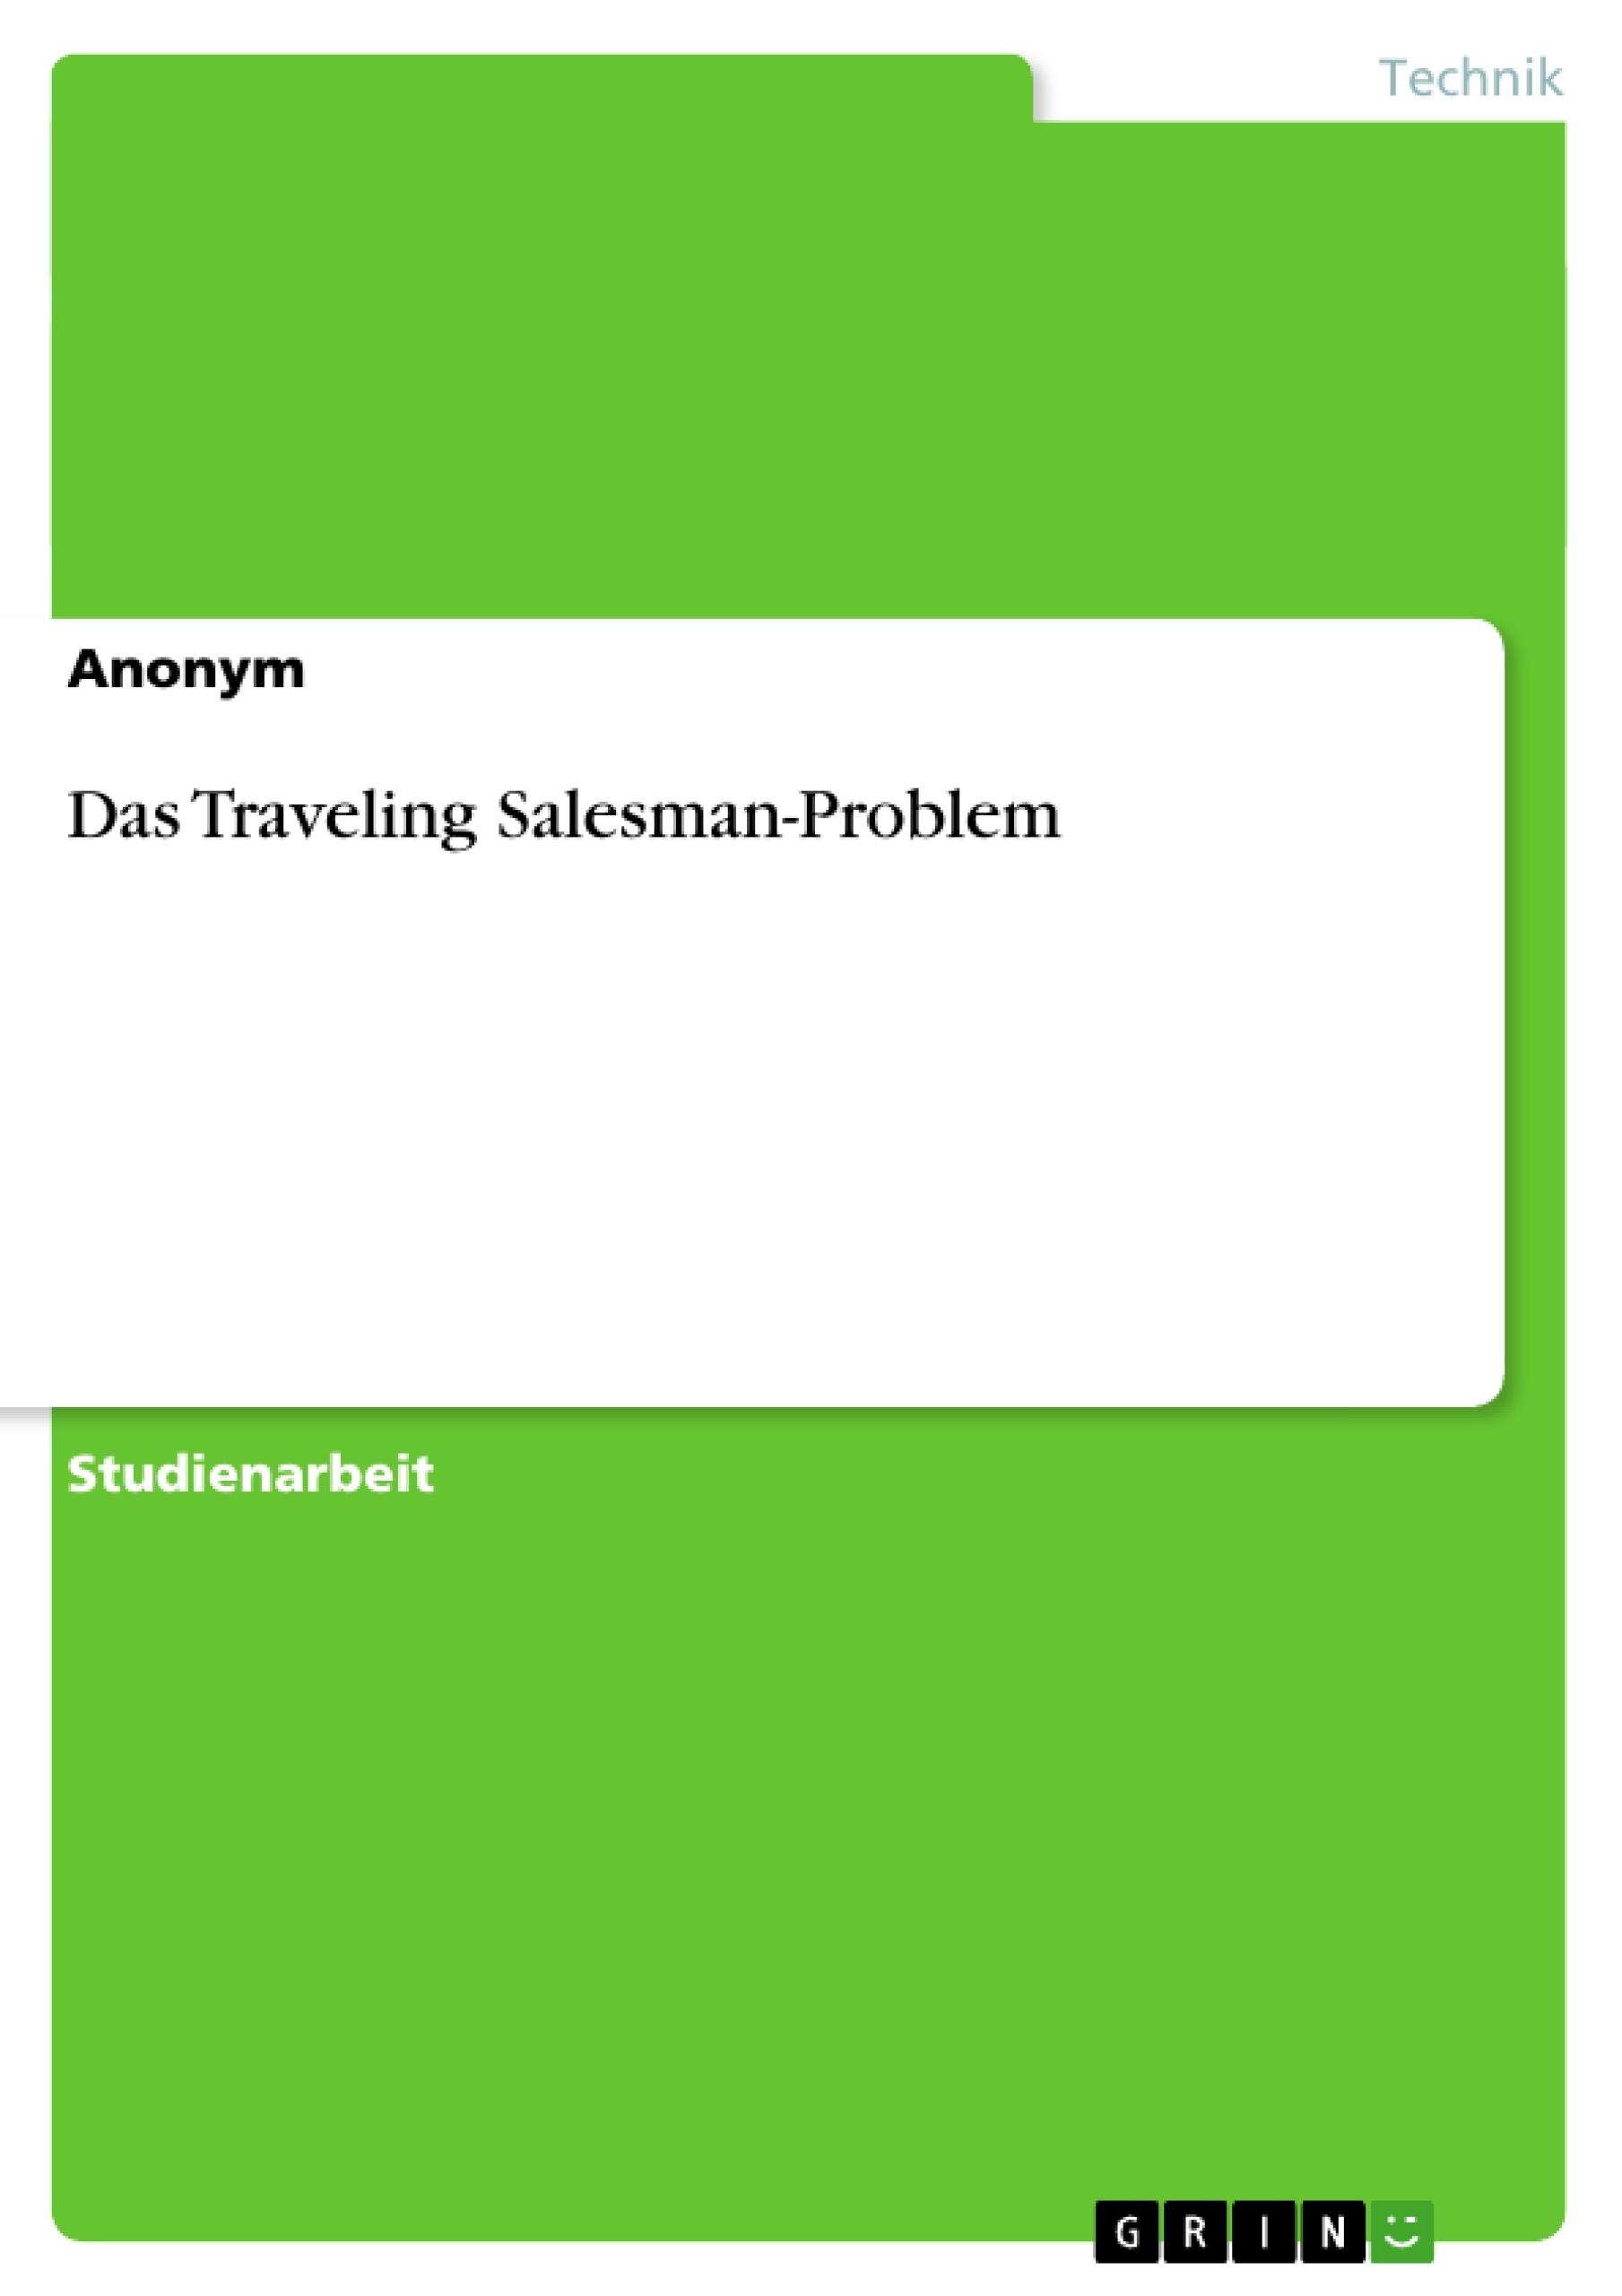 Titel: Das Traveling Salesman-Problem